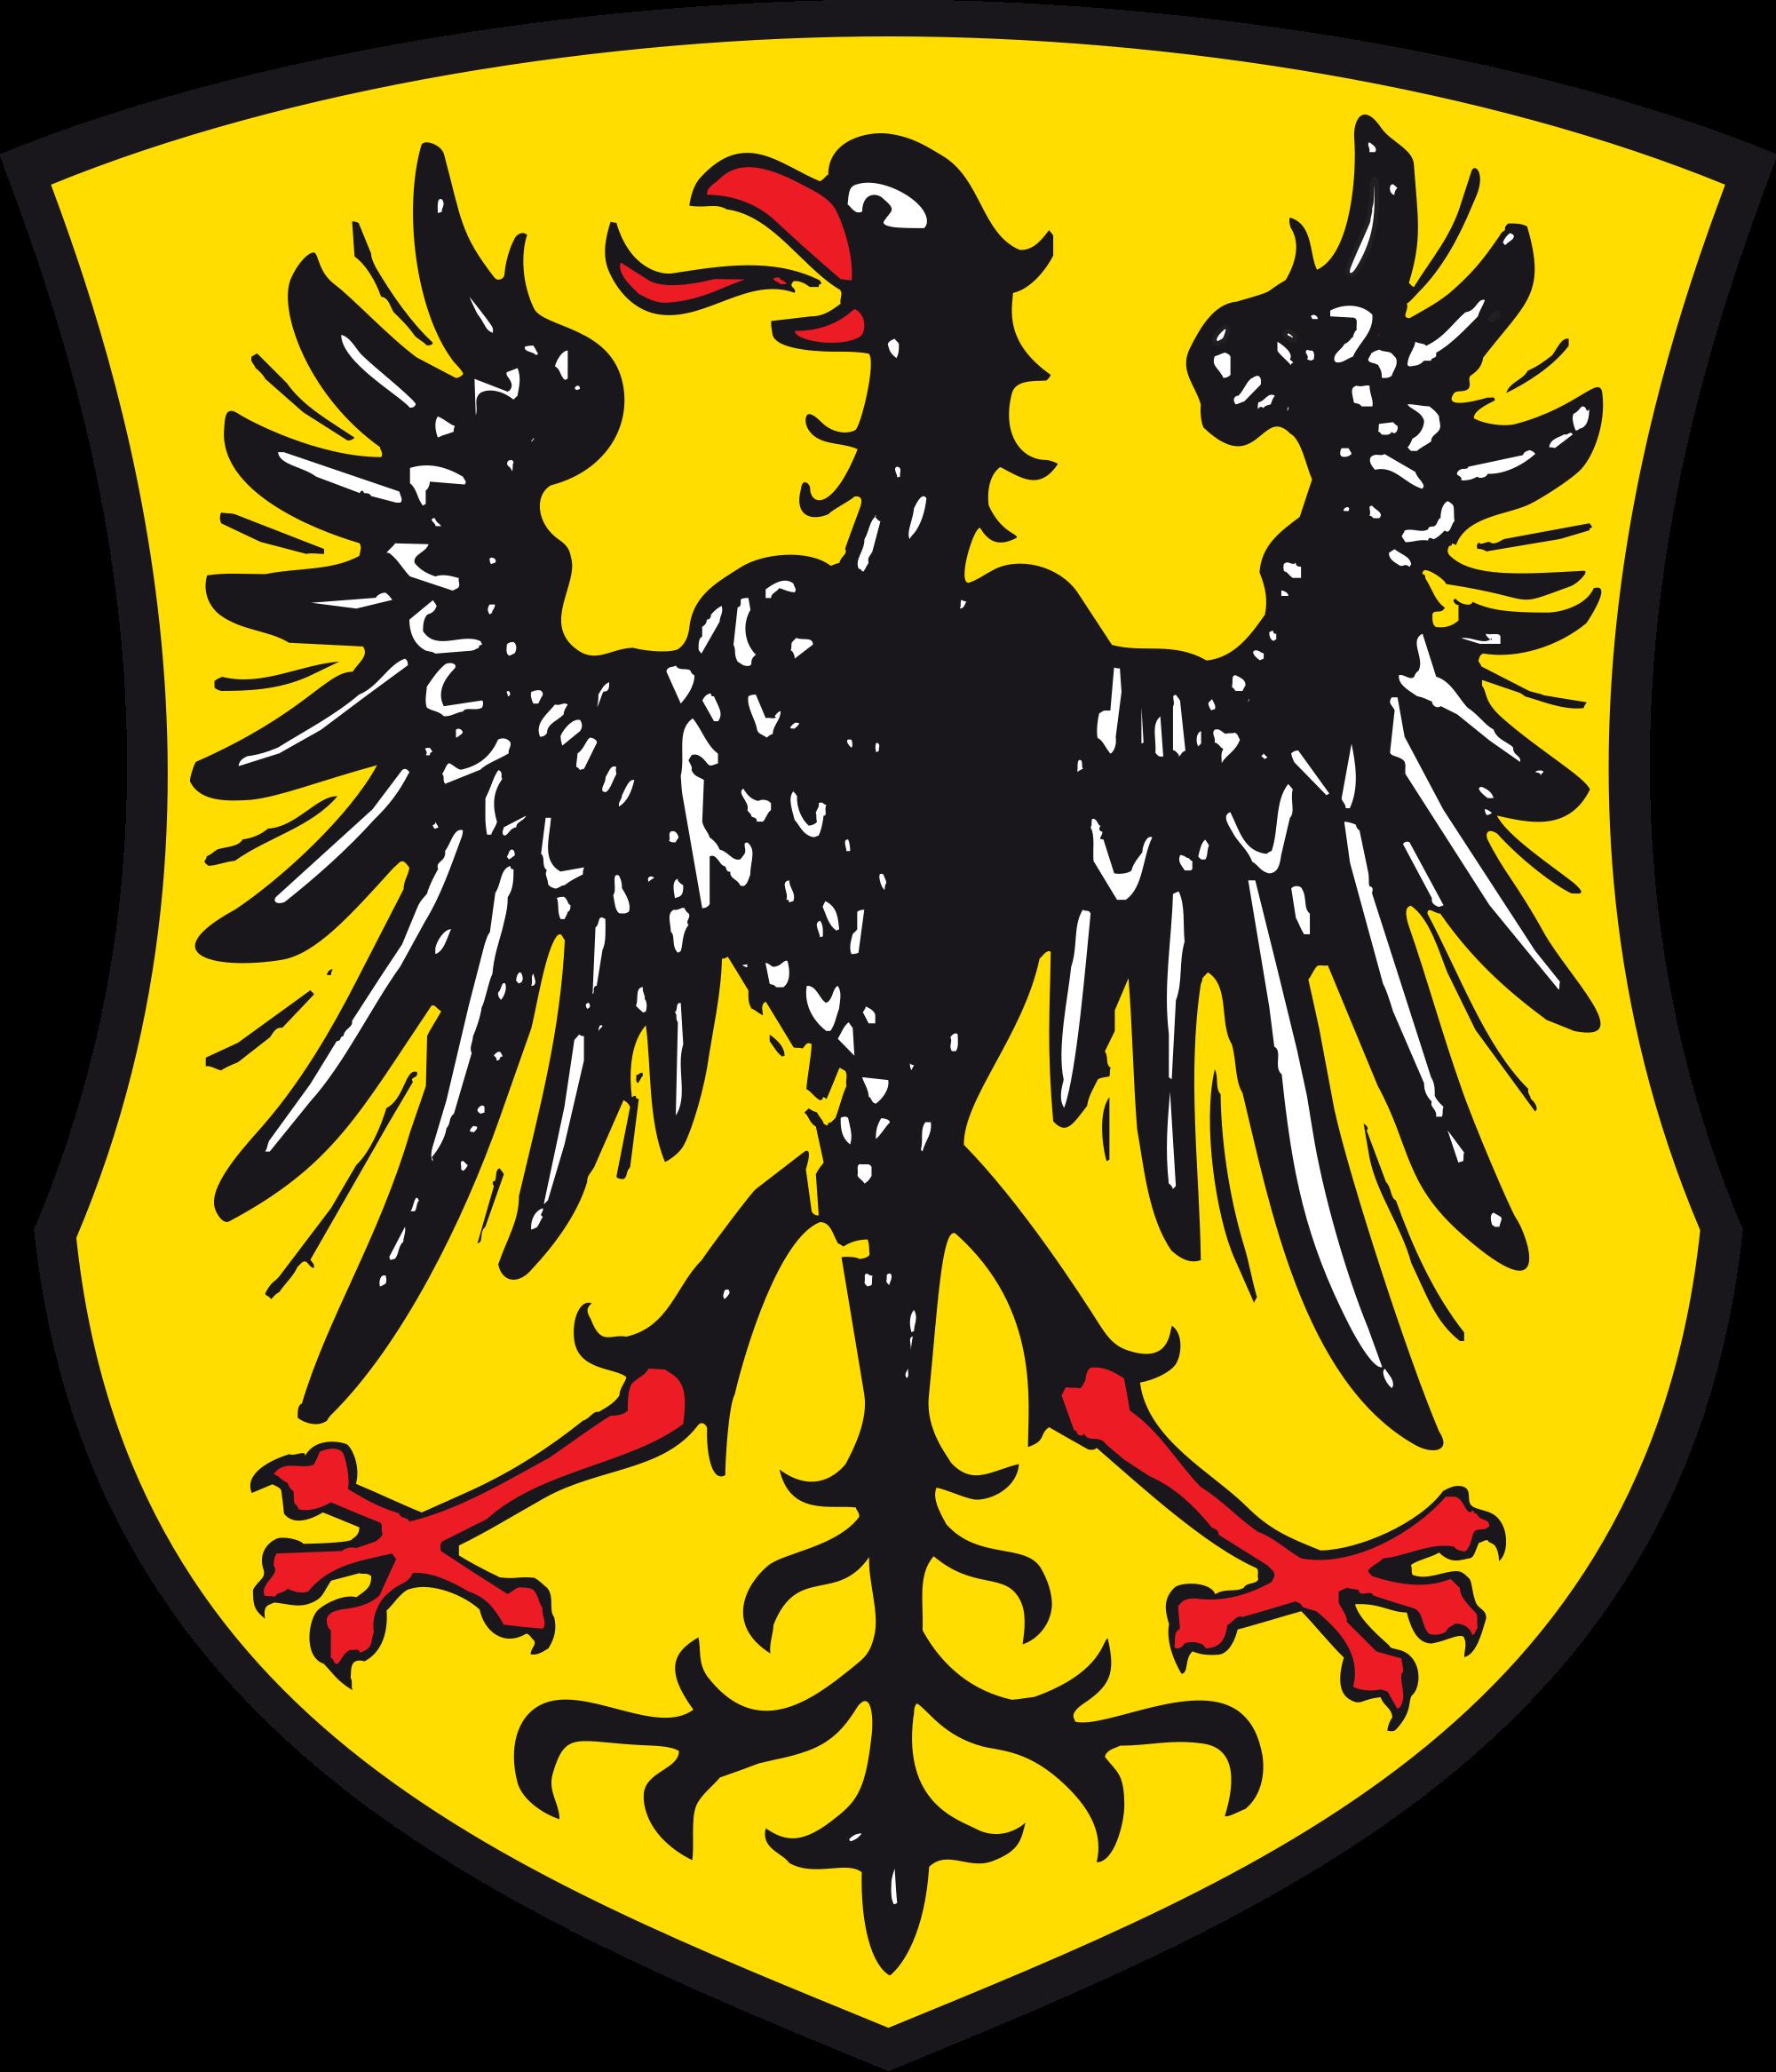 File:Wappen Harburg (Schwaben).svg.